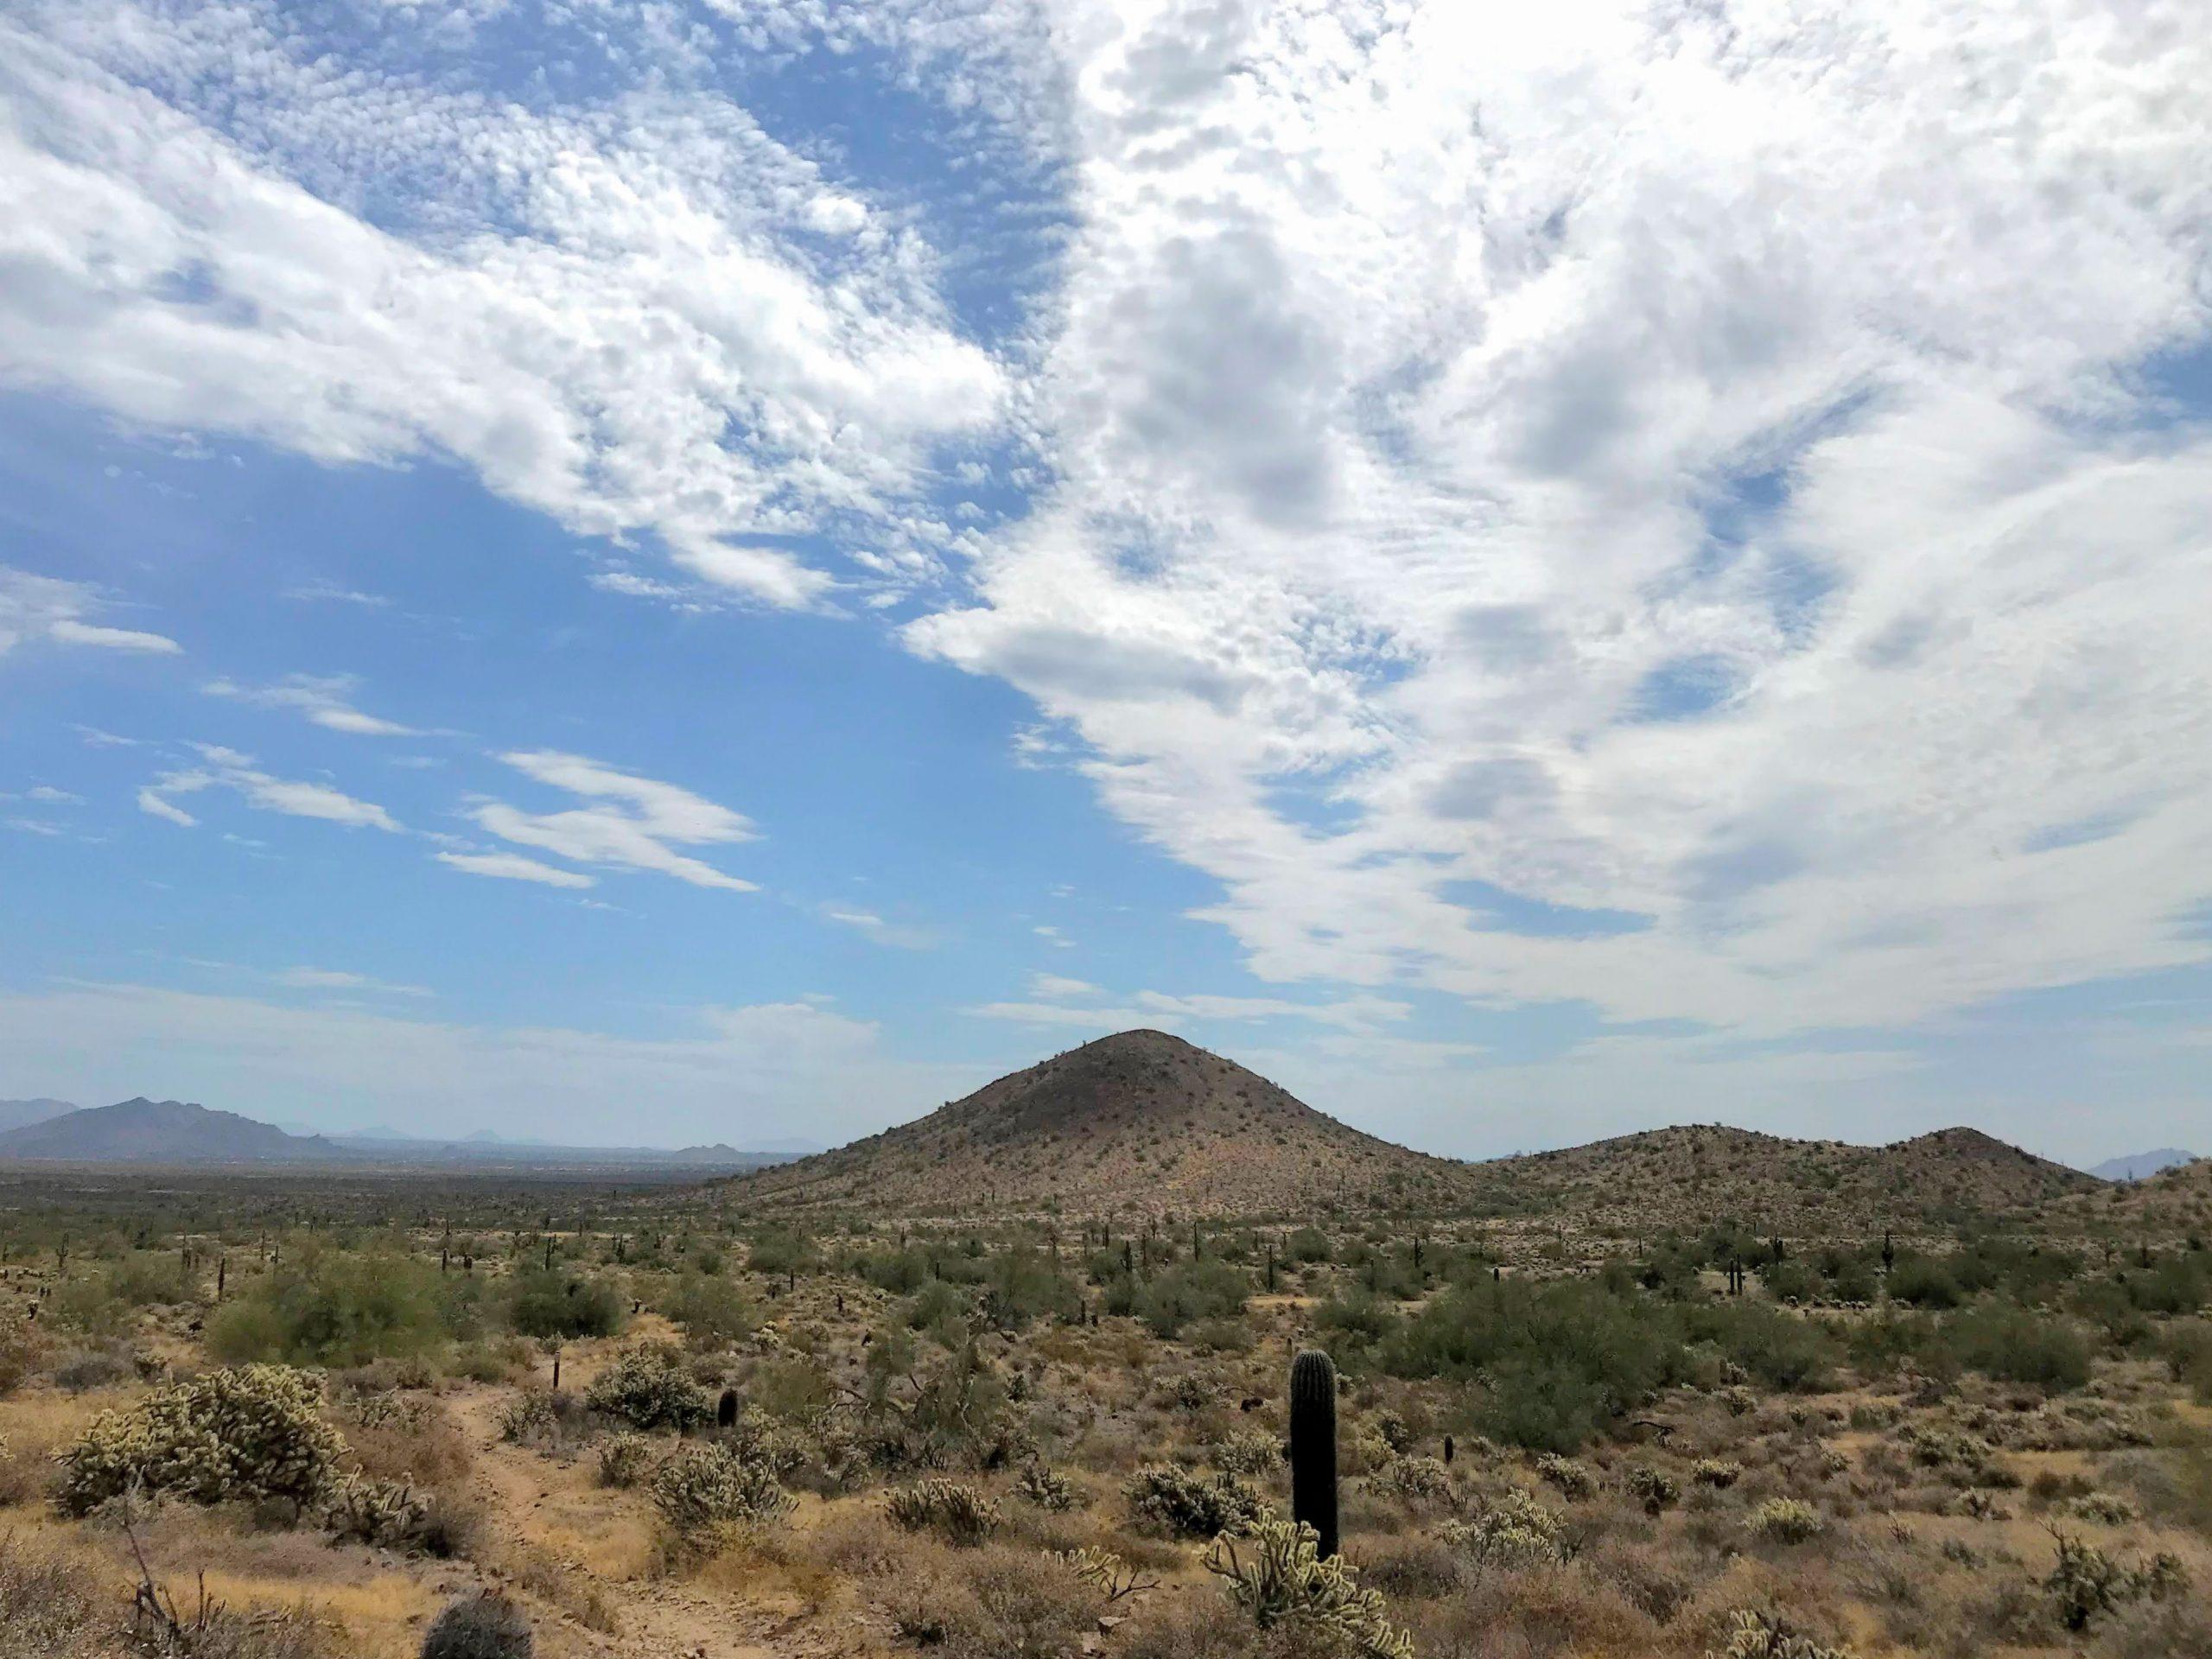 Desert Vista Trailhead Hikes, Phoenix Sonoran Preserve flat area perfect for camping